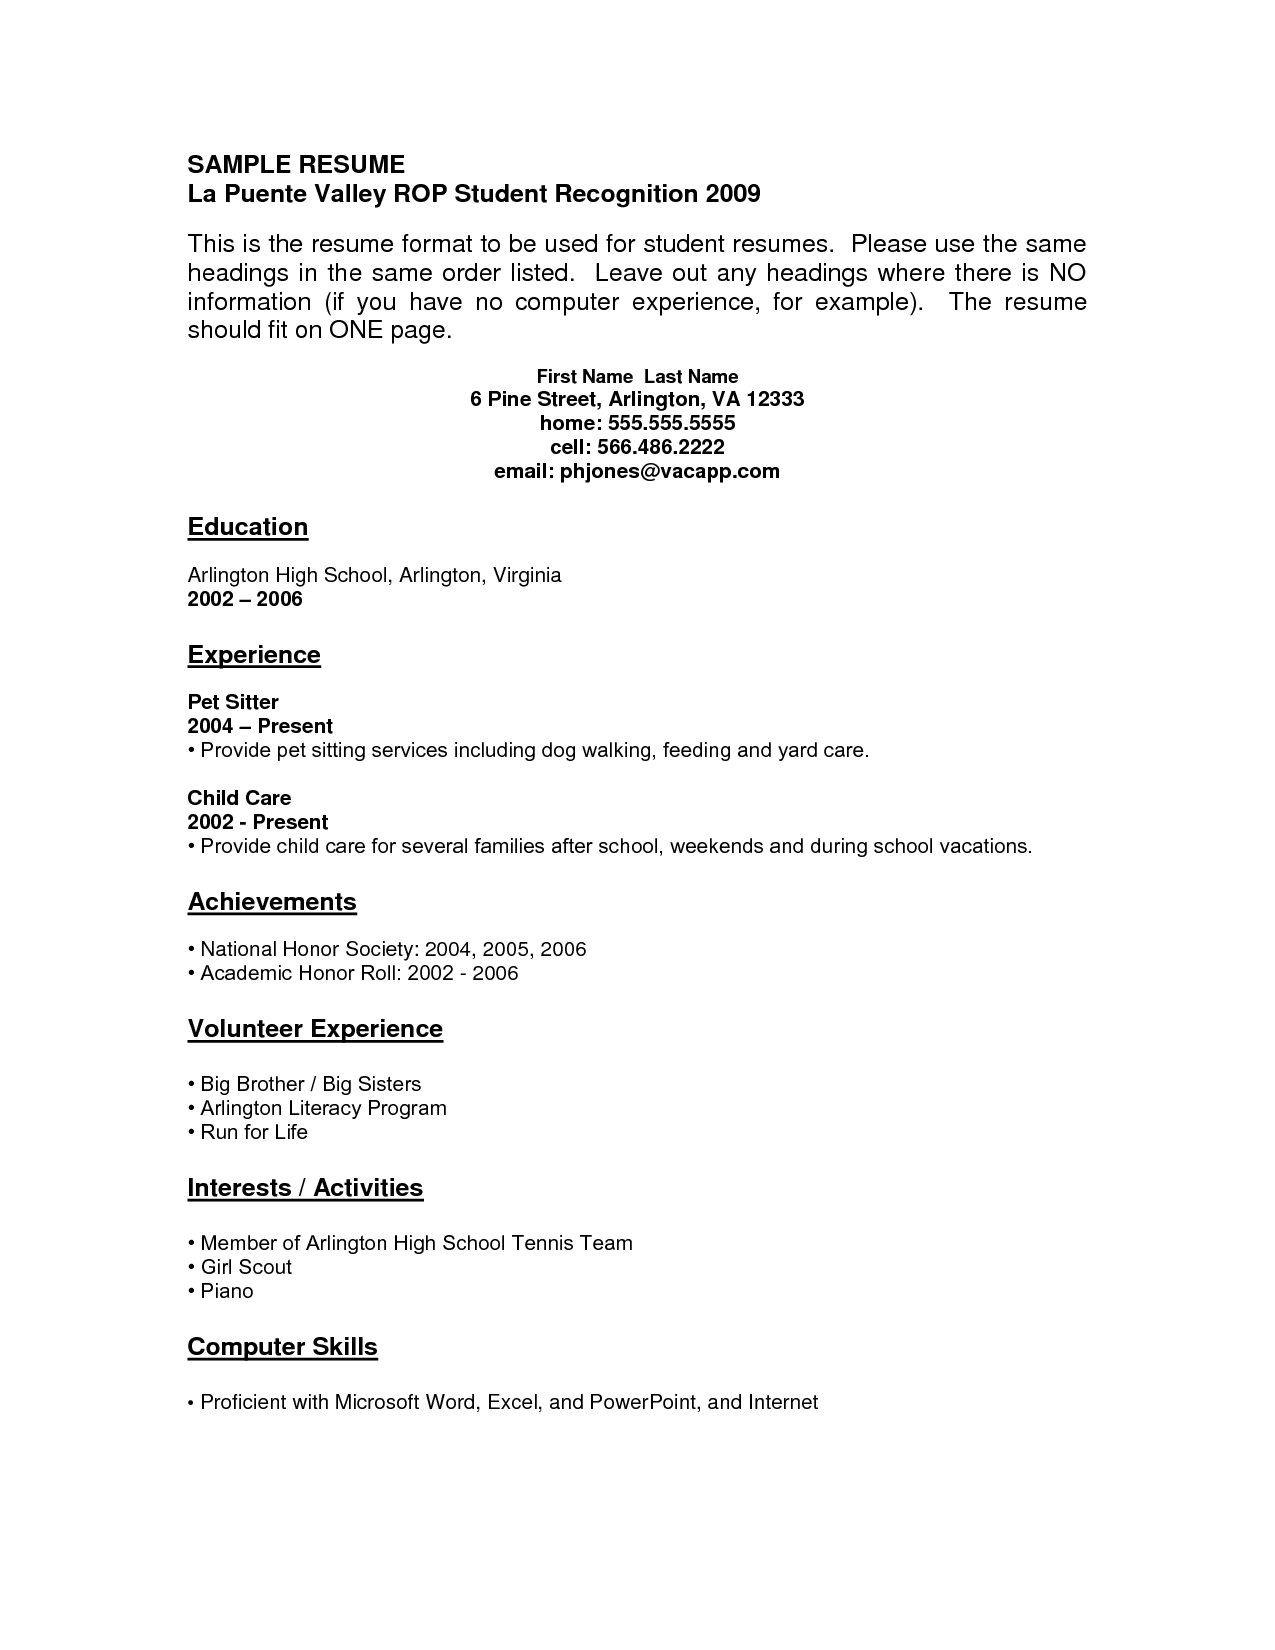 Free Resume Templates No Experience Resume no experience